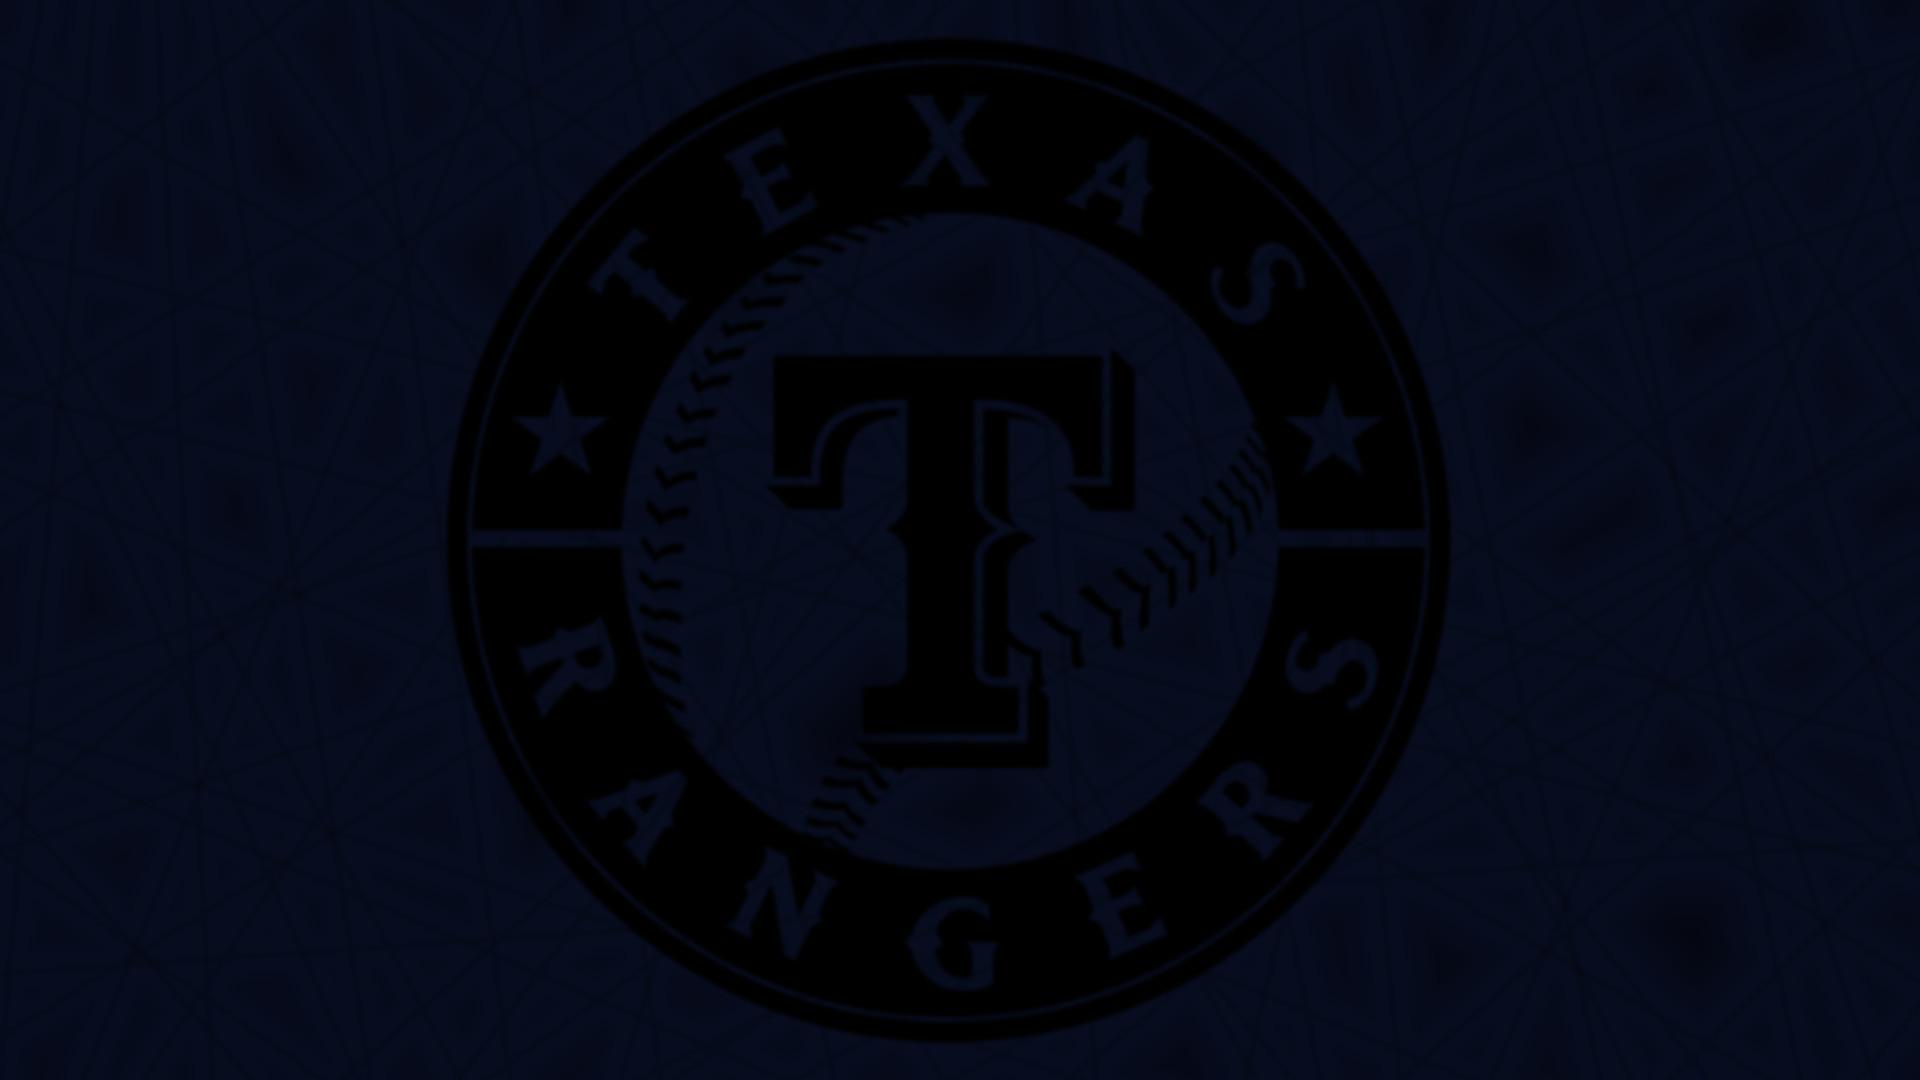 texas rangers desktop wallpaper